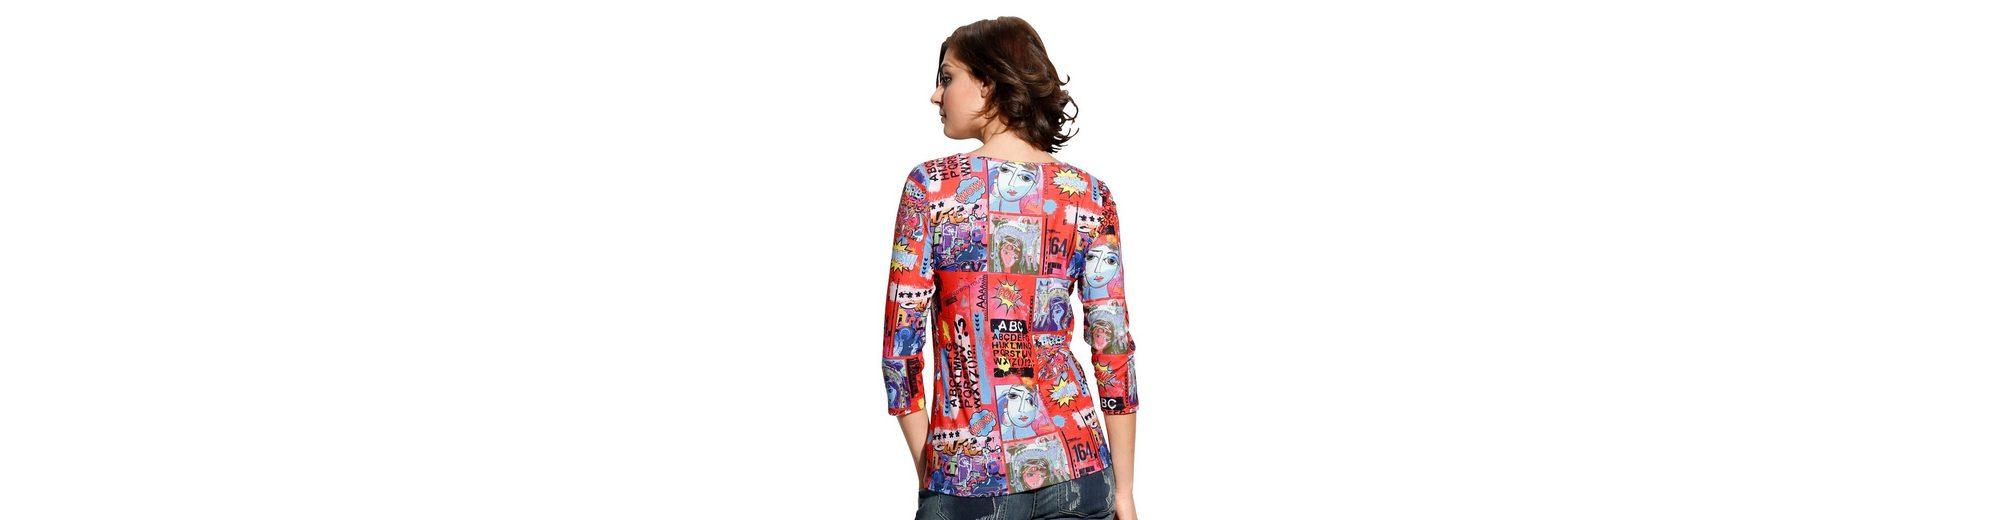 Alba Moda Druckshirt im Popart-Druck allover Rabatt Fabrikverkauf Neuester Günstiger Preis Footlocker Bilder Outlet Online-Shop fkd1KH7